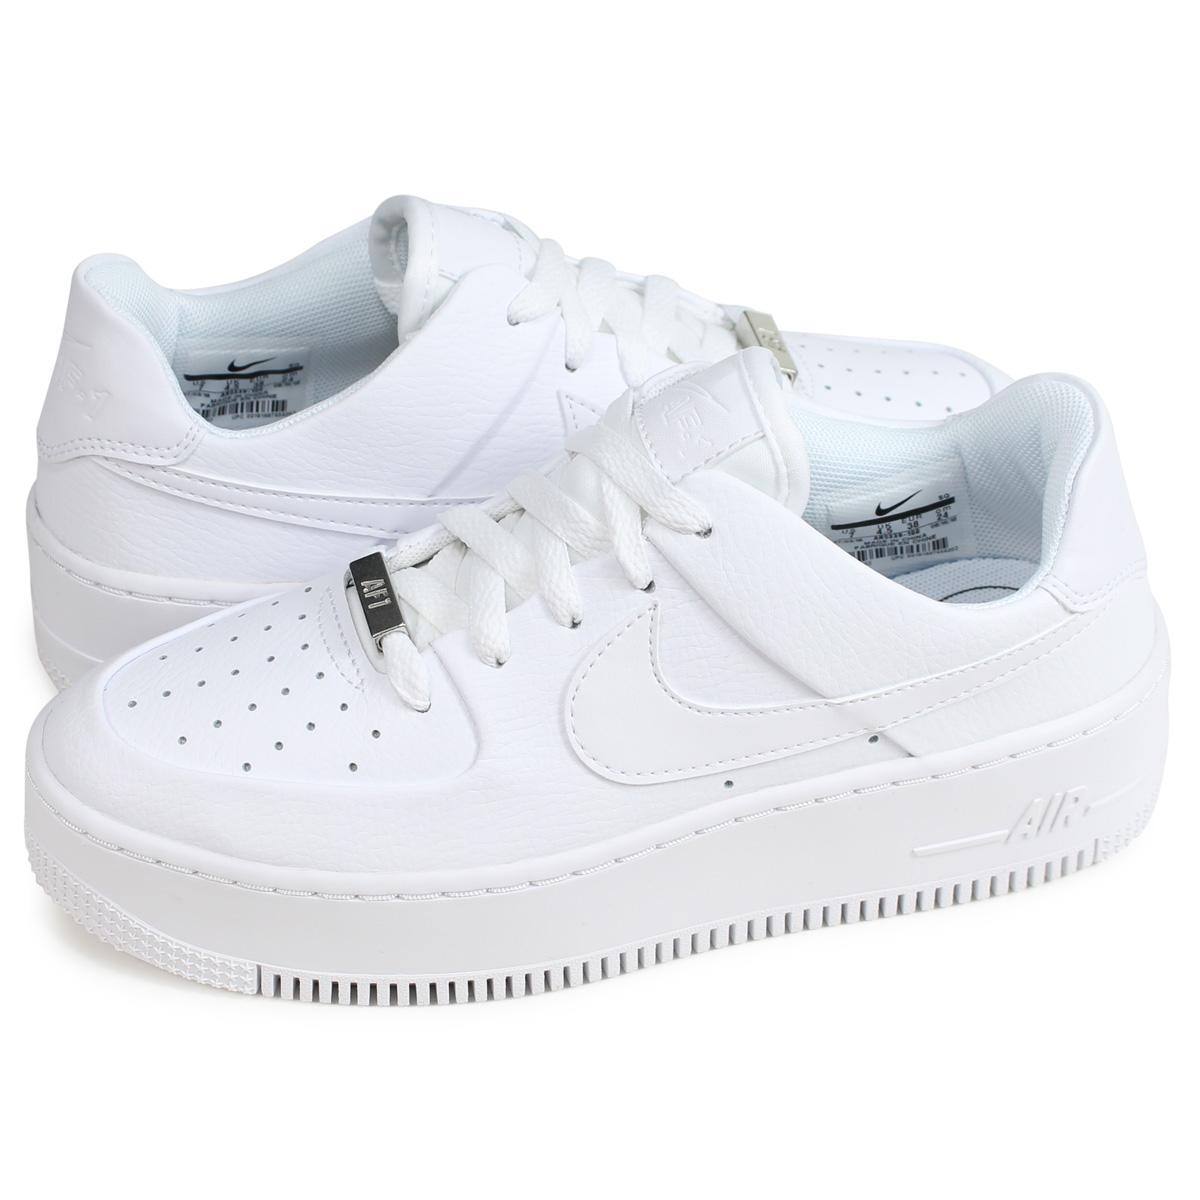 Nike Wmns Air Force 1 Sage Low WhiteWhite AR5339 100 | Free